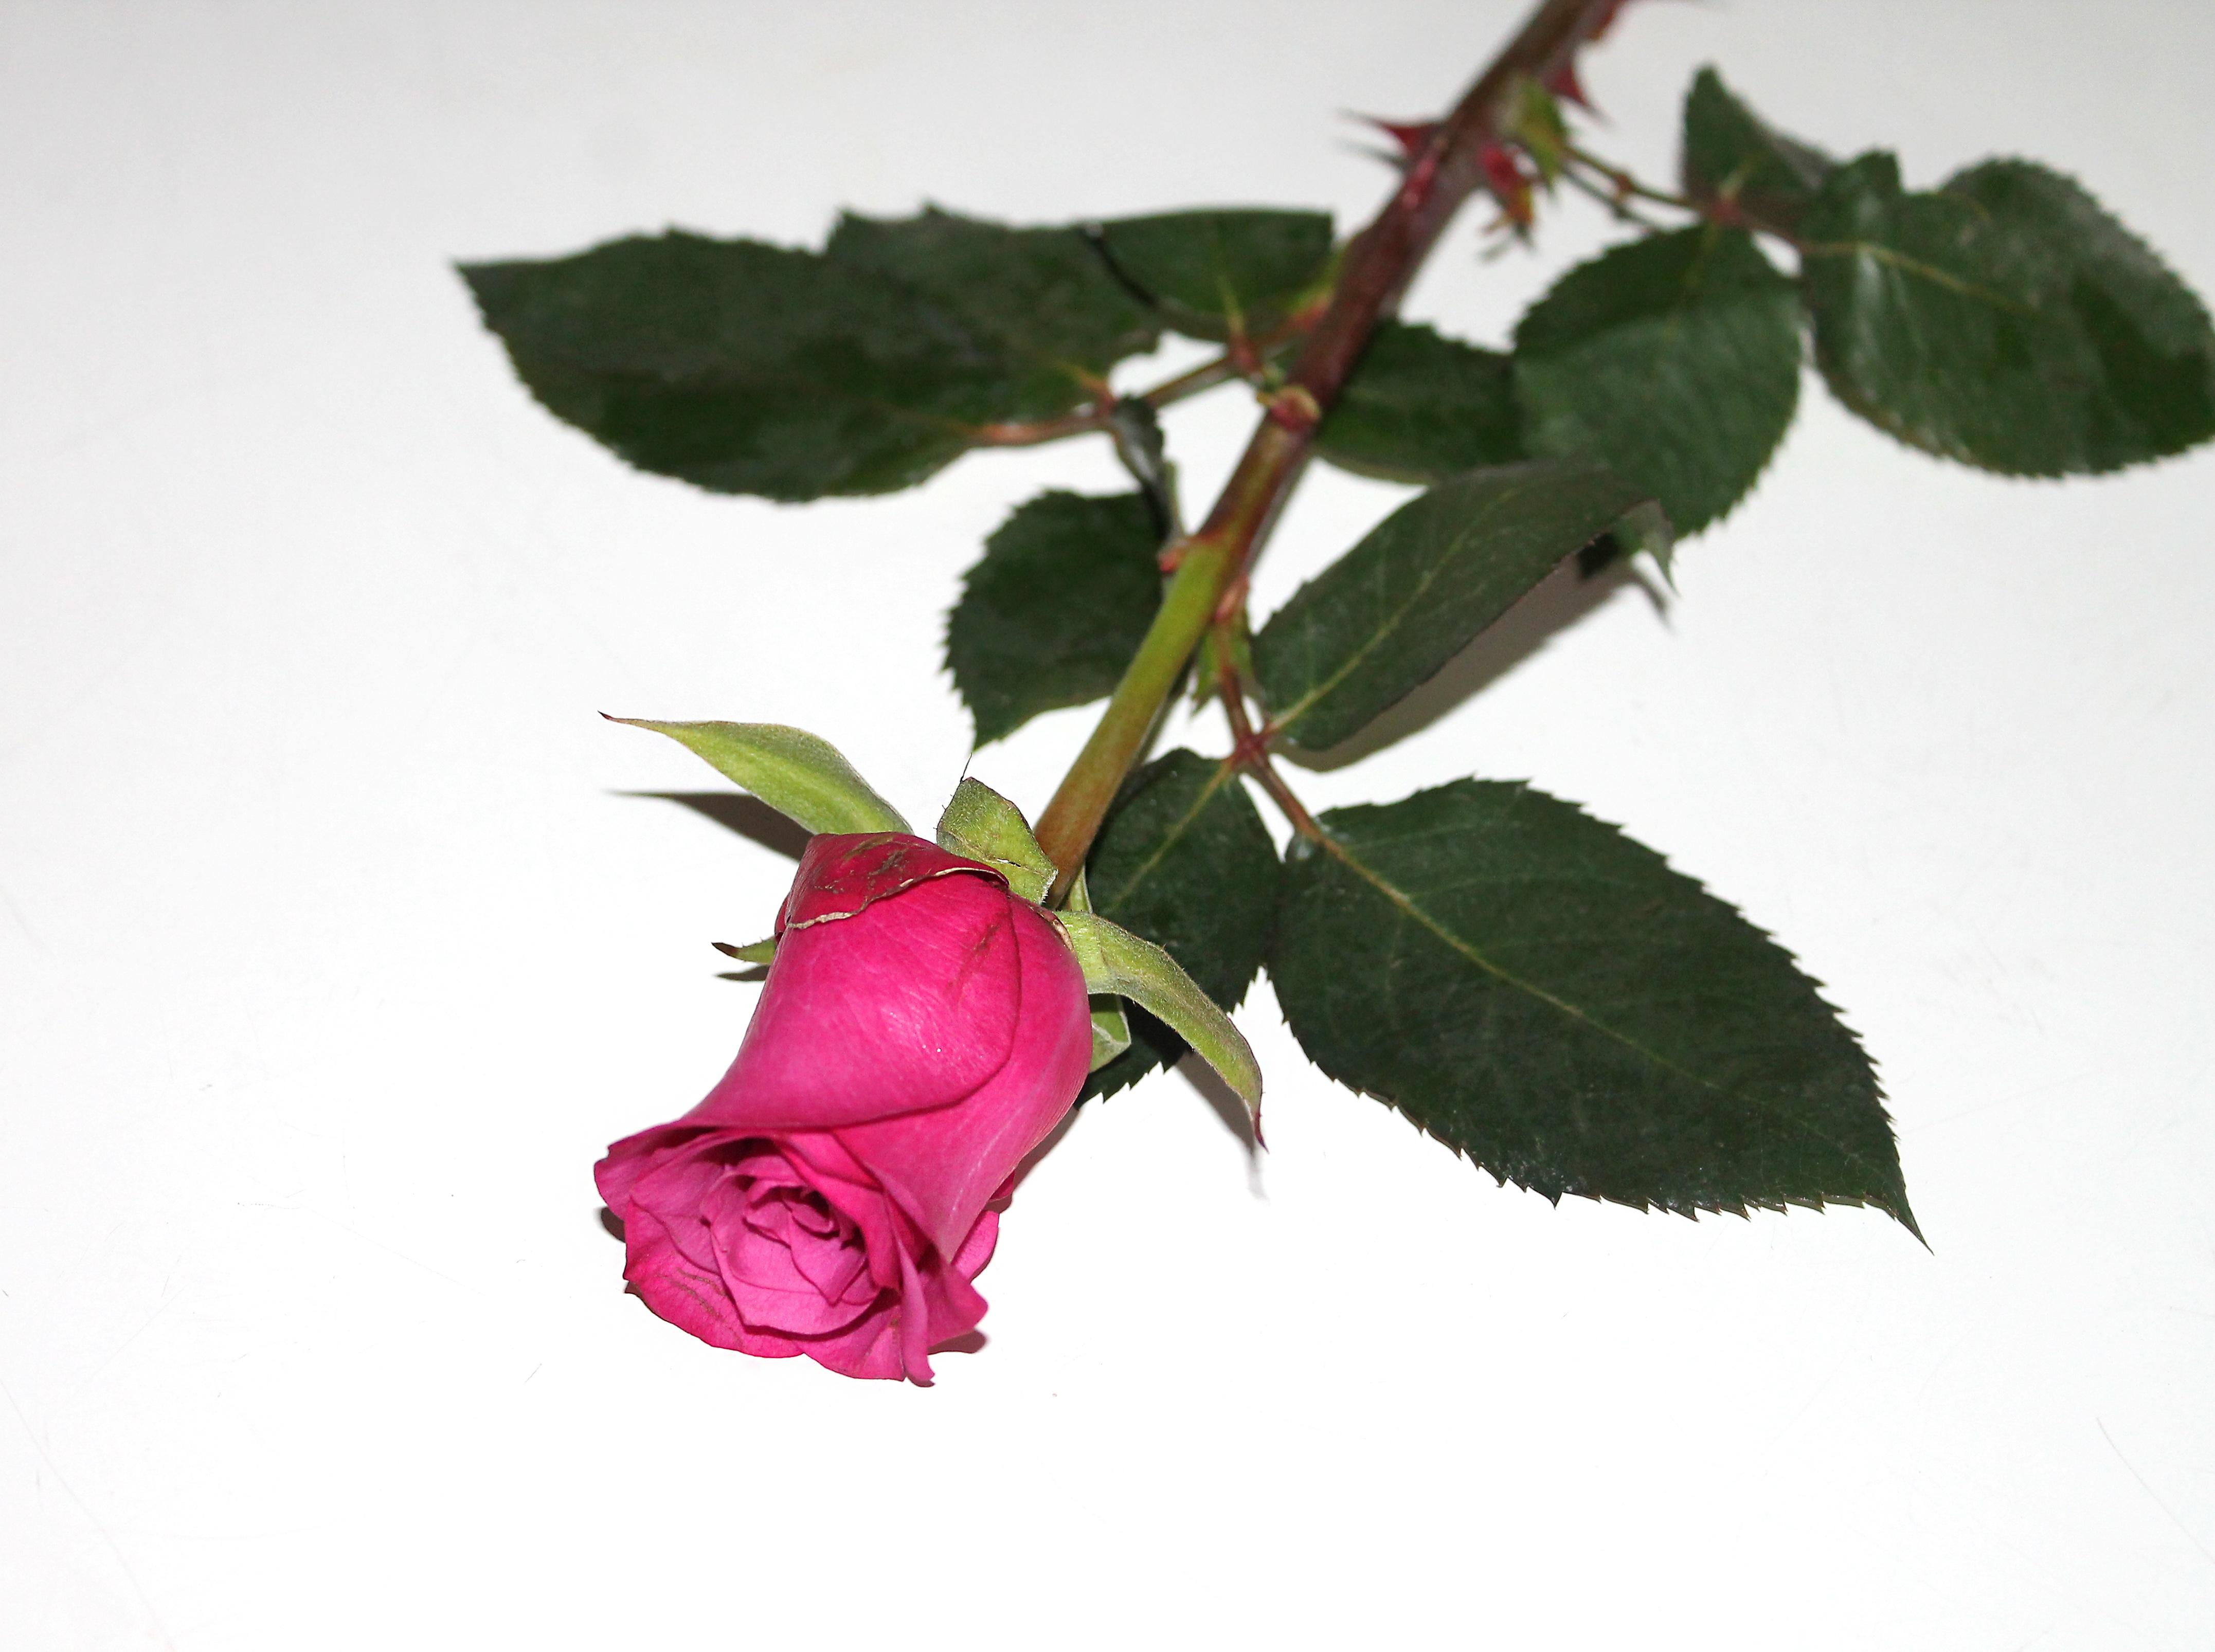 Kostenlose foto : Ast, Blatt, Blütenblatt, Liebe, Lebensmittel ...